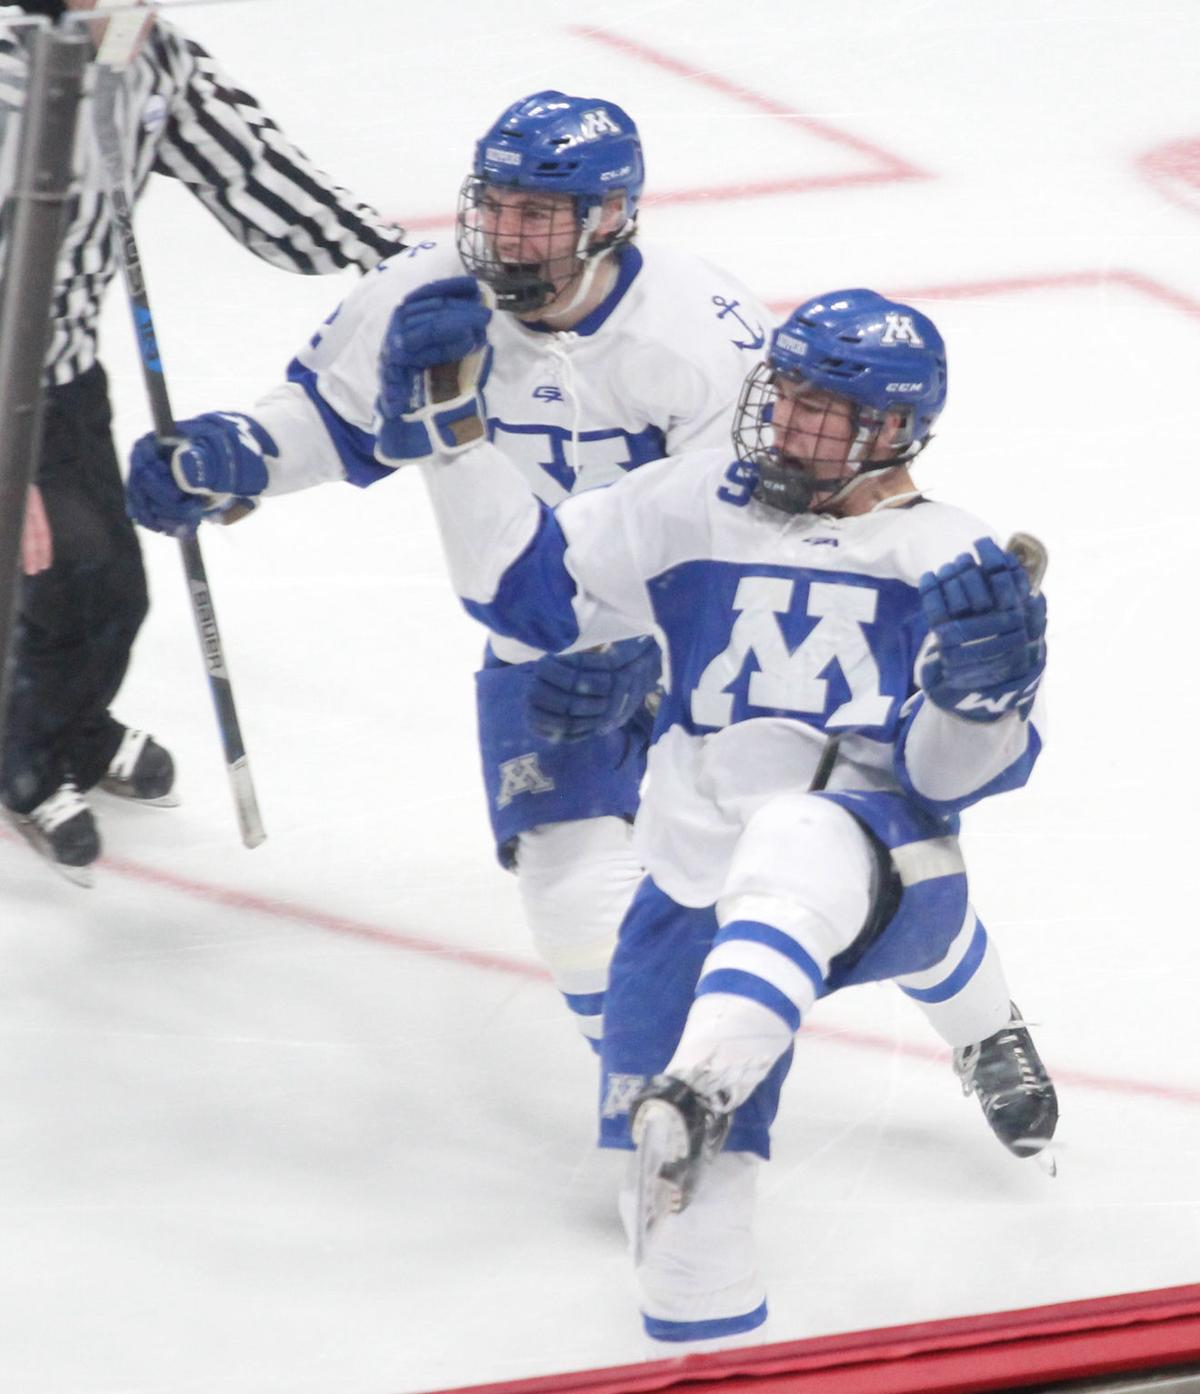 Tonka Hockey - Brink